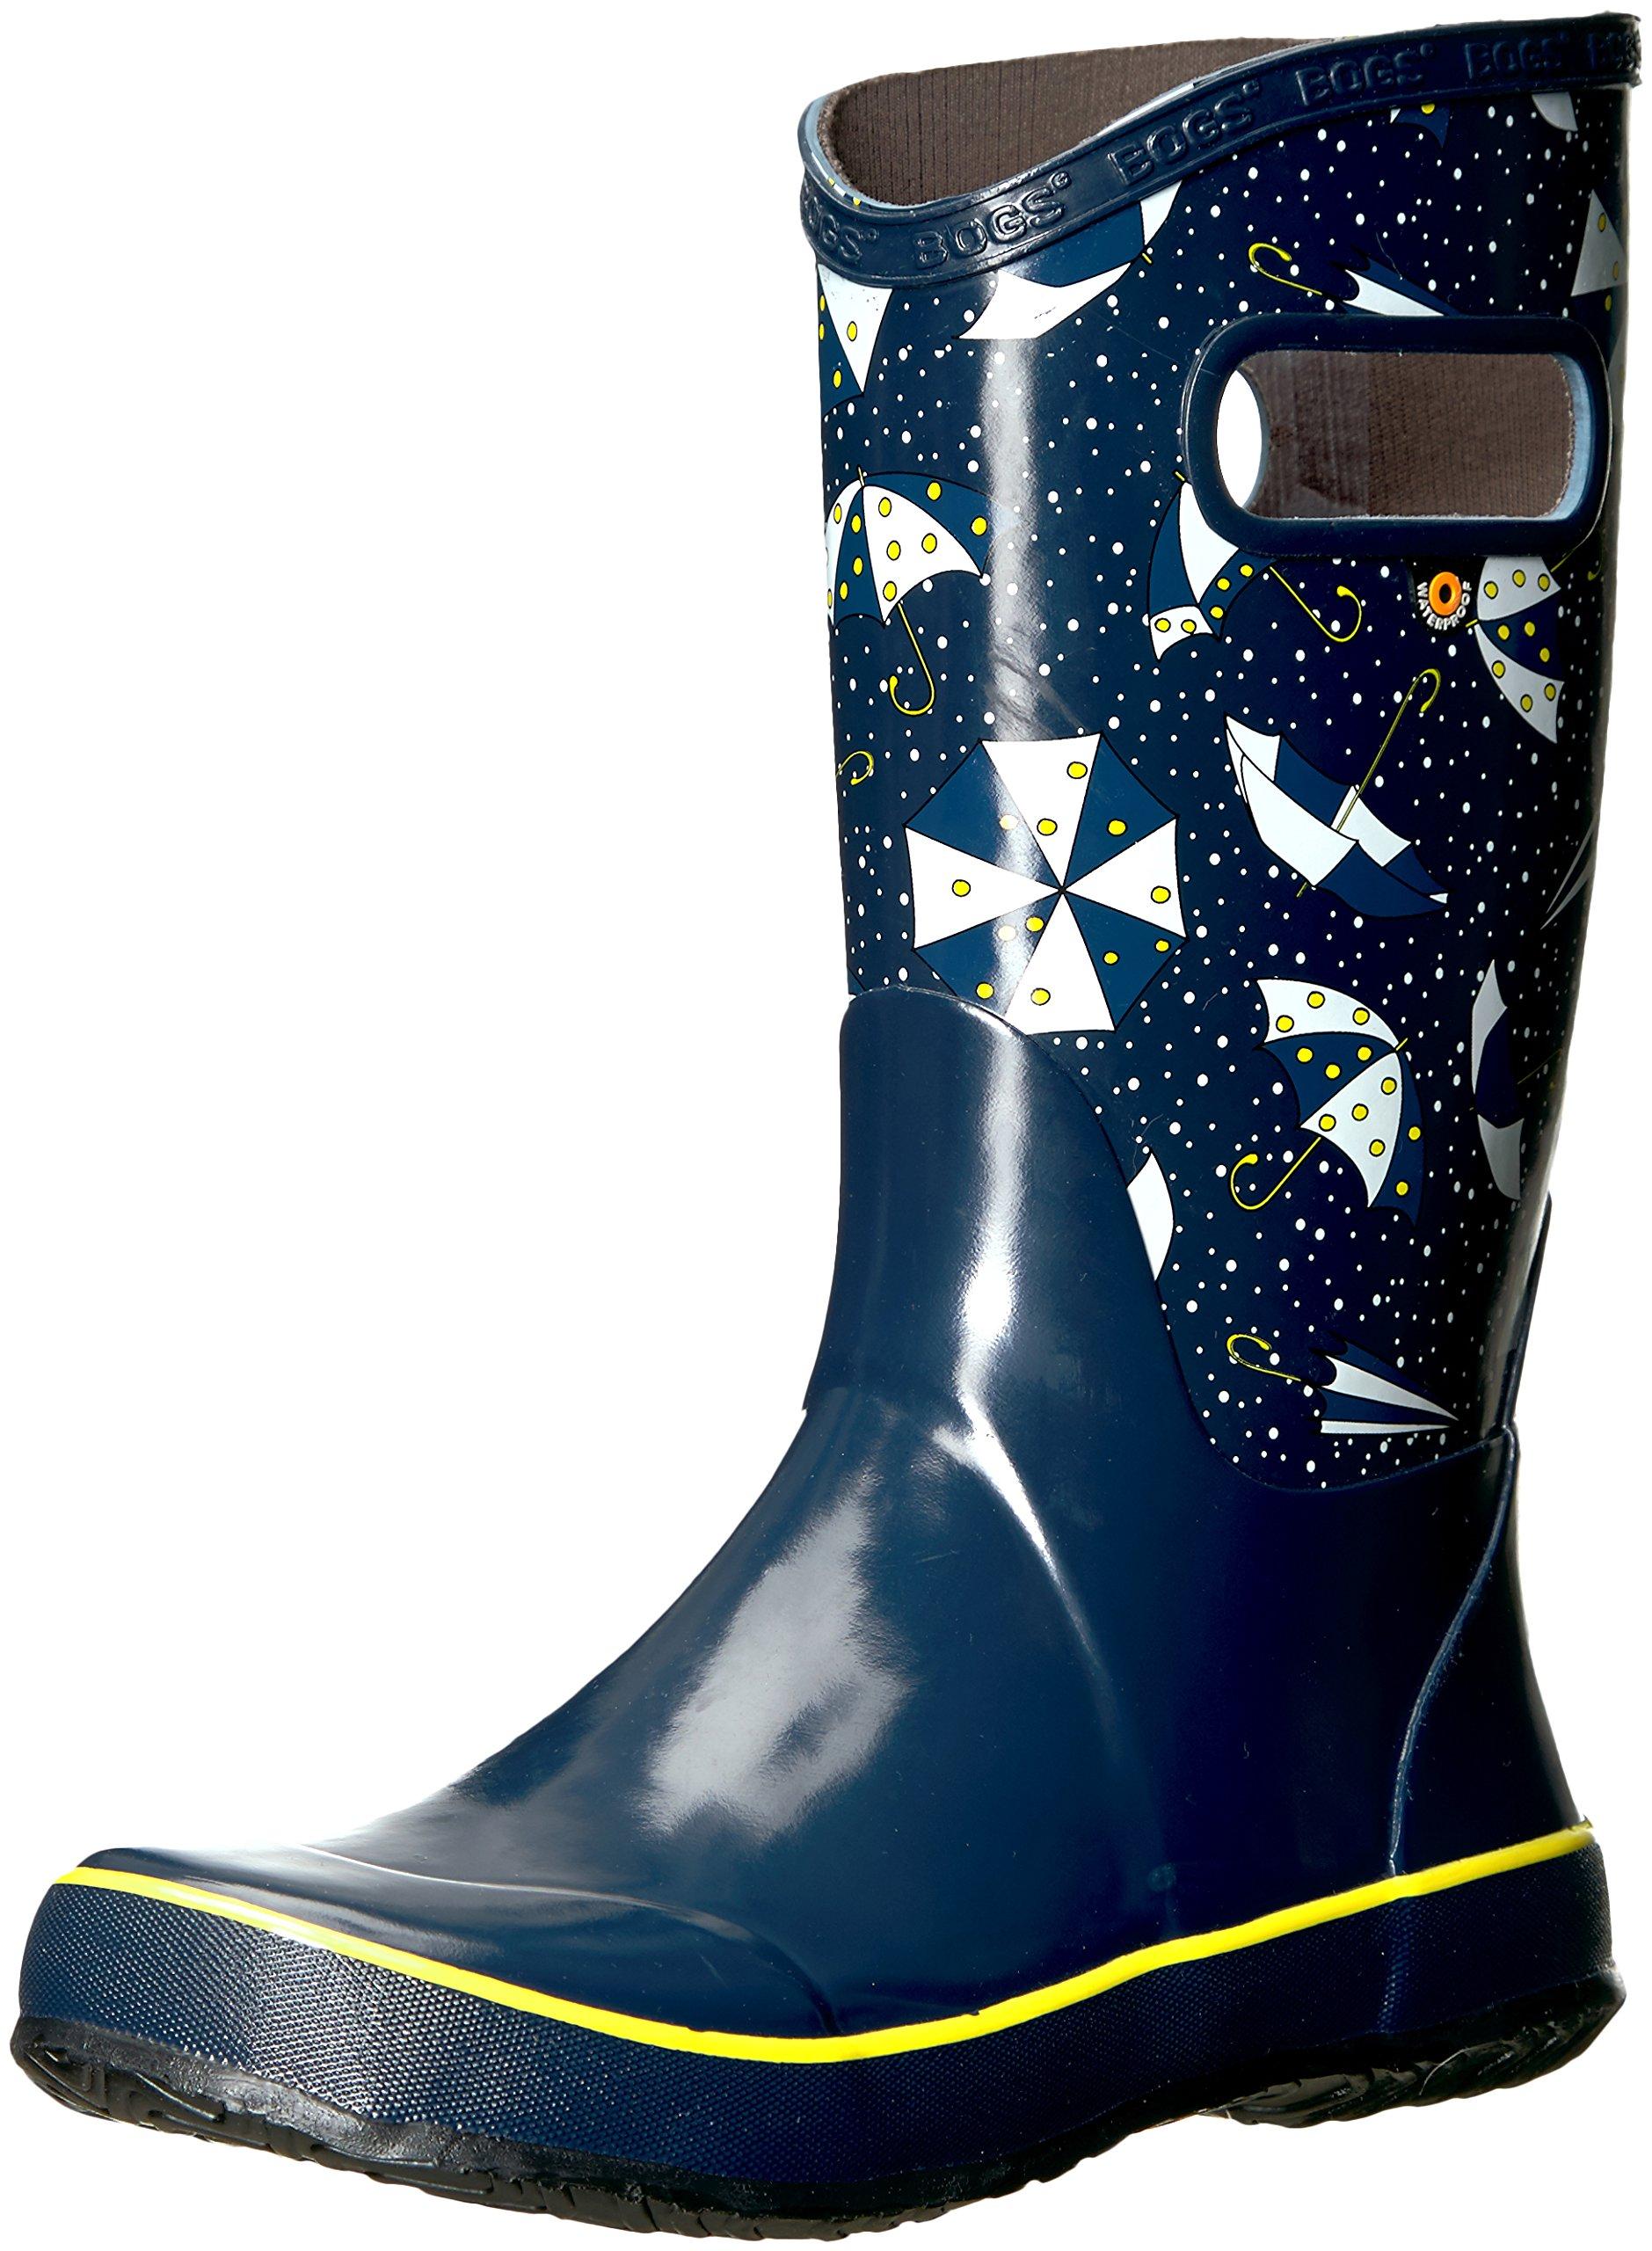 Bogs Riley Kids Slip-On Waterproof Low Top Rain Boot for Boys and Girls